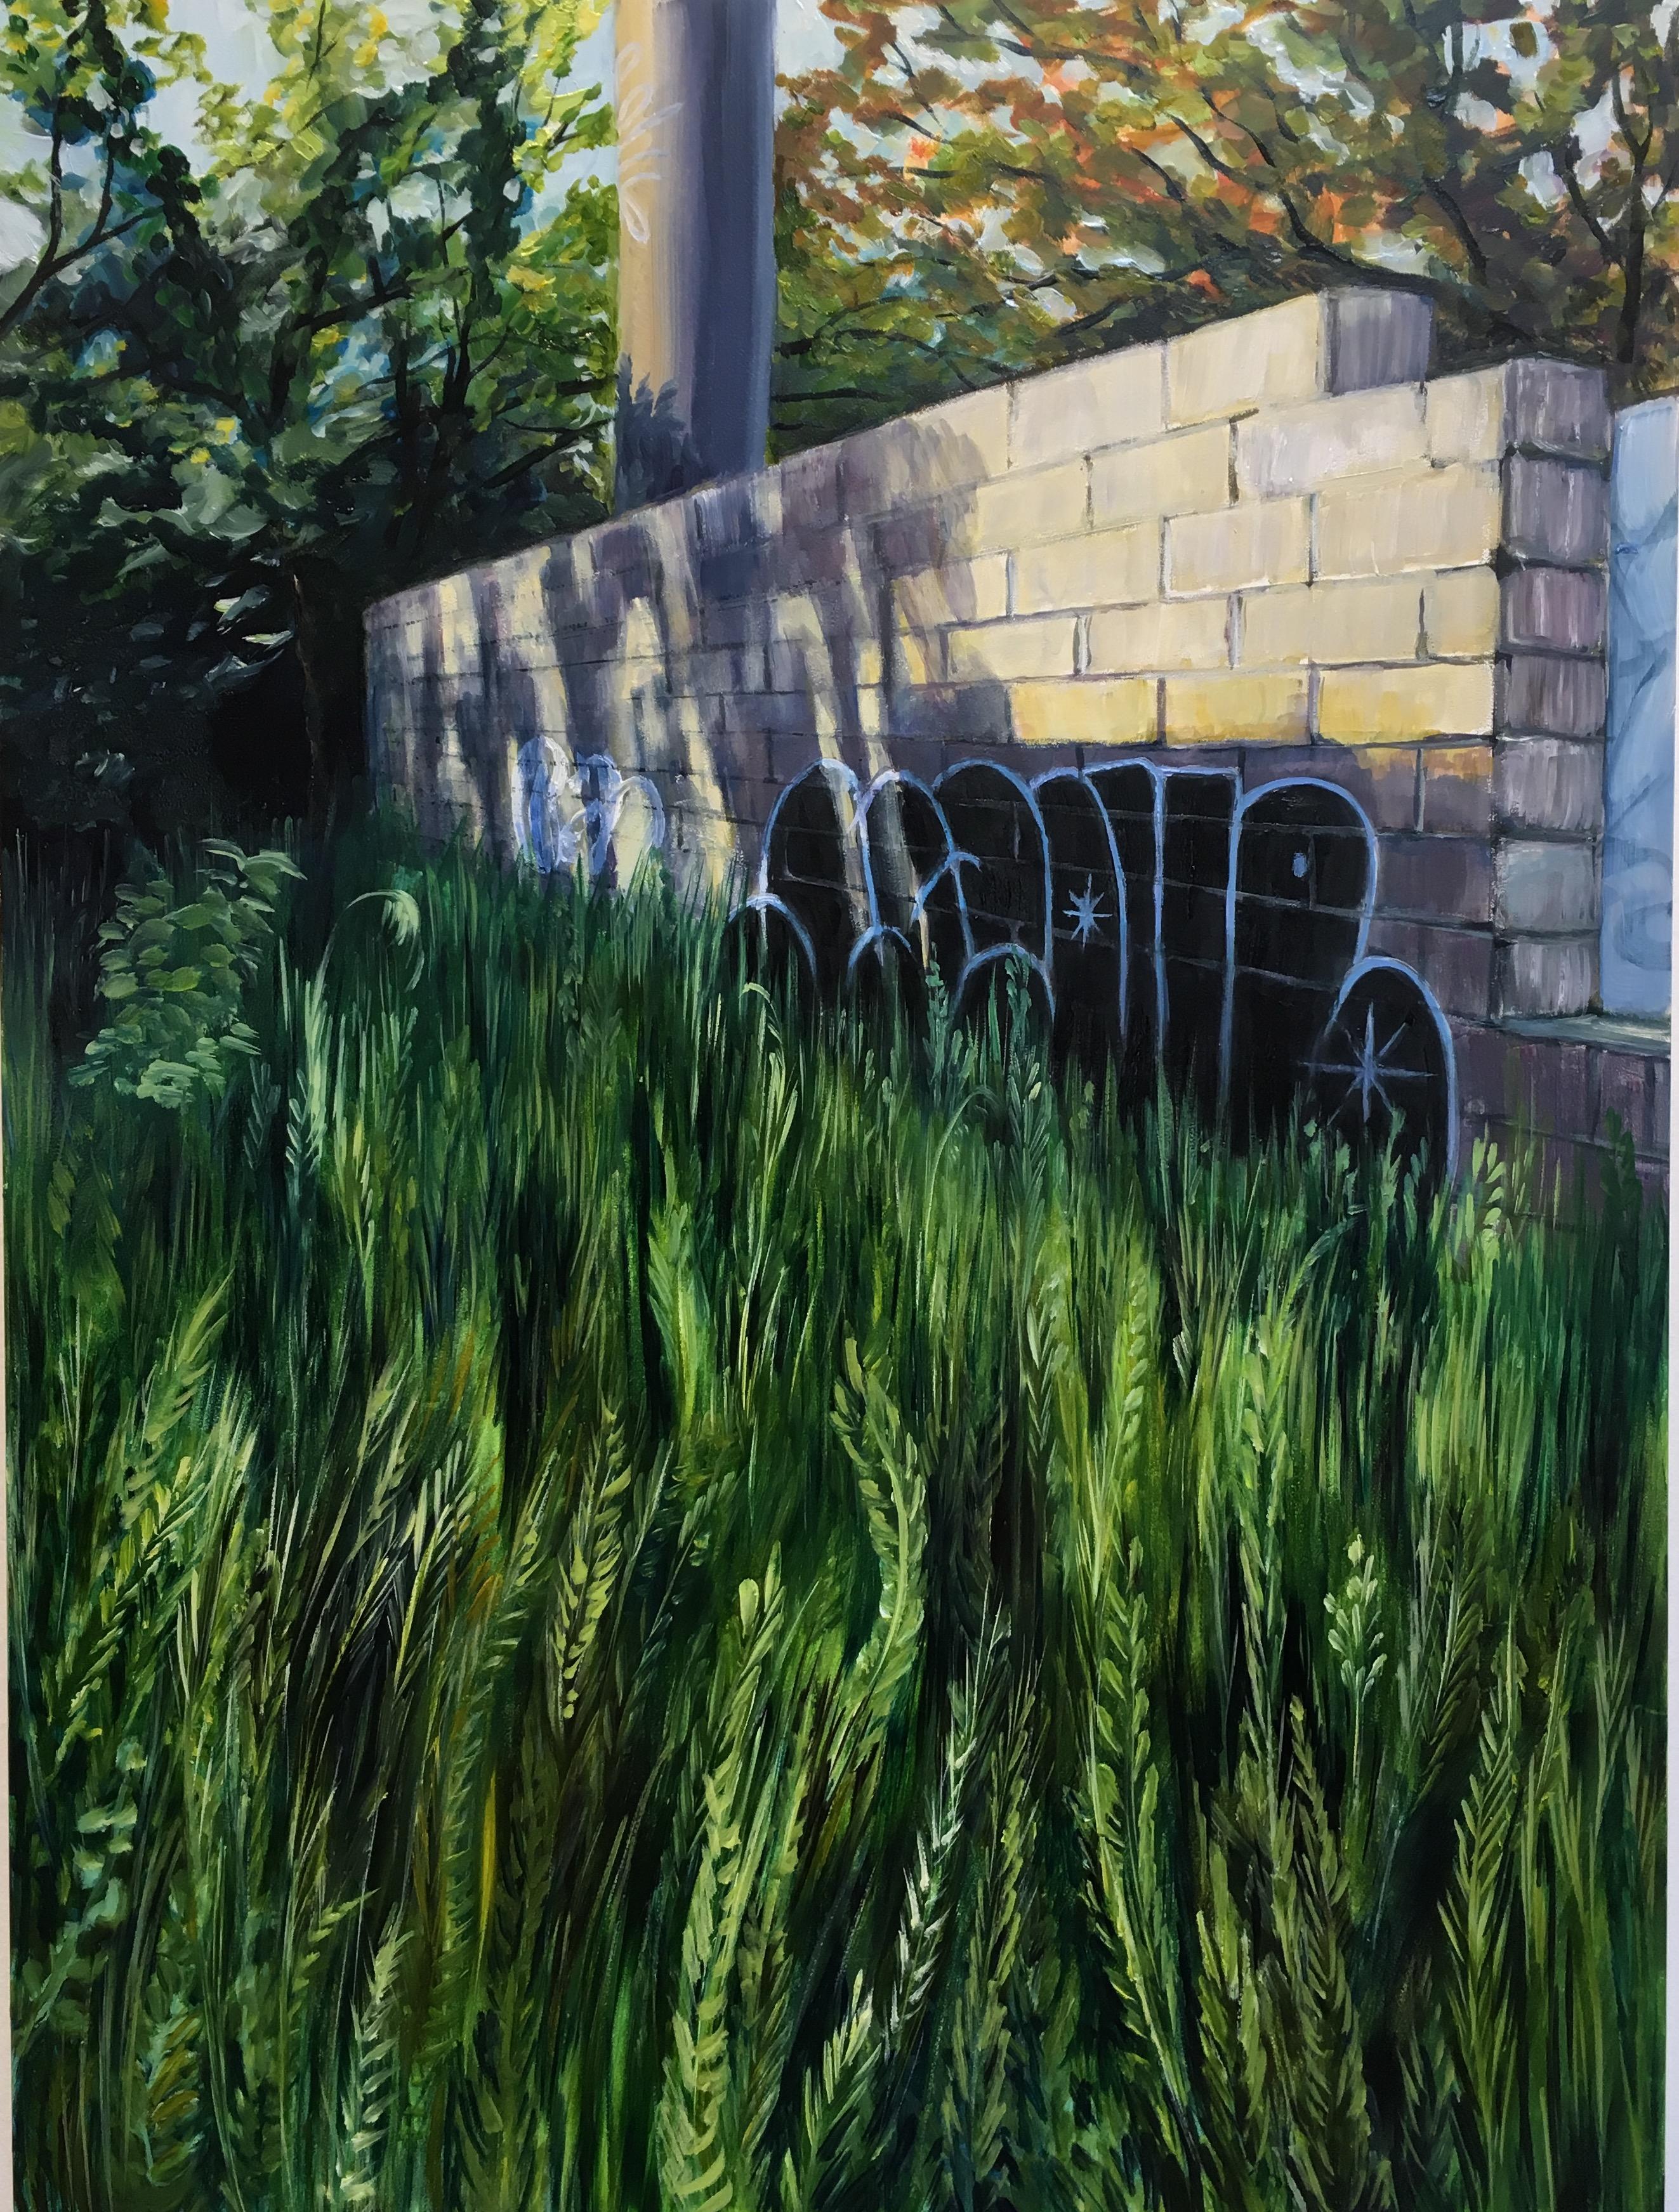 Empty Lot: Field of Grass, left